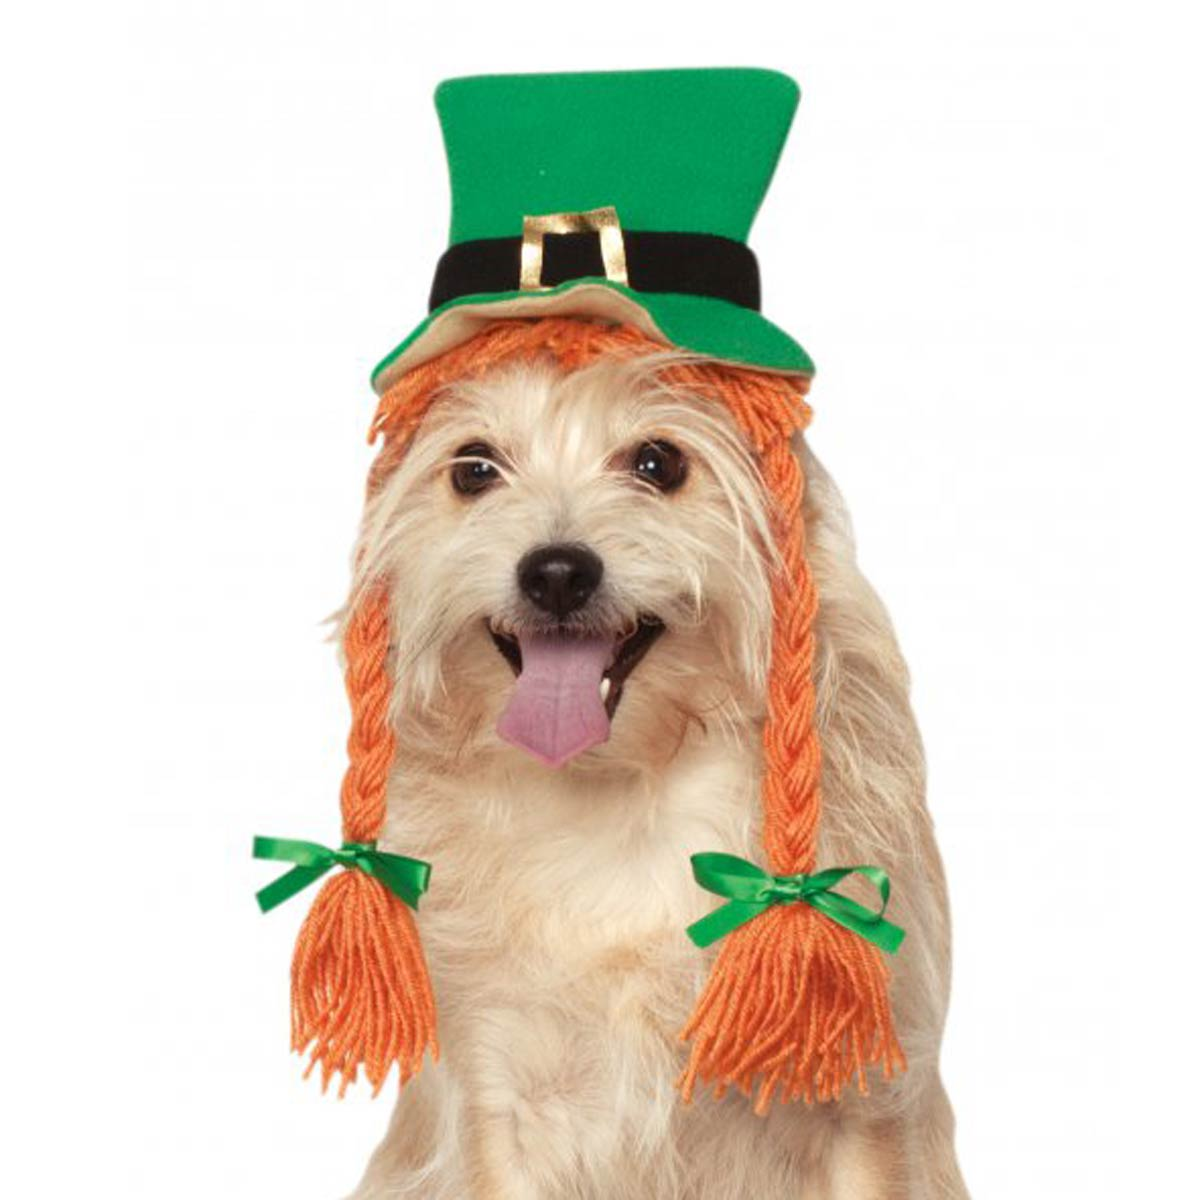 St Patty's Day Dog Hat with Braids